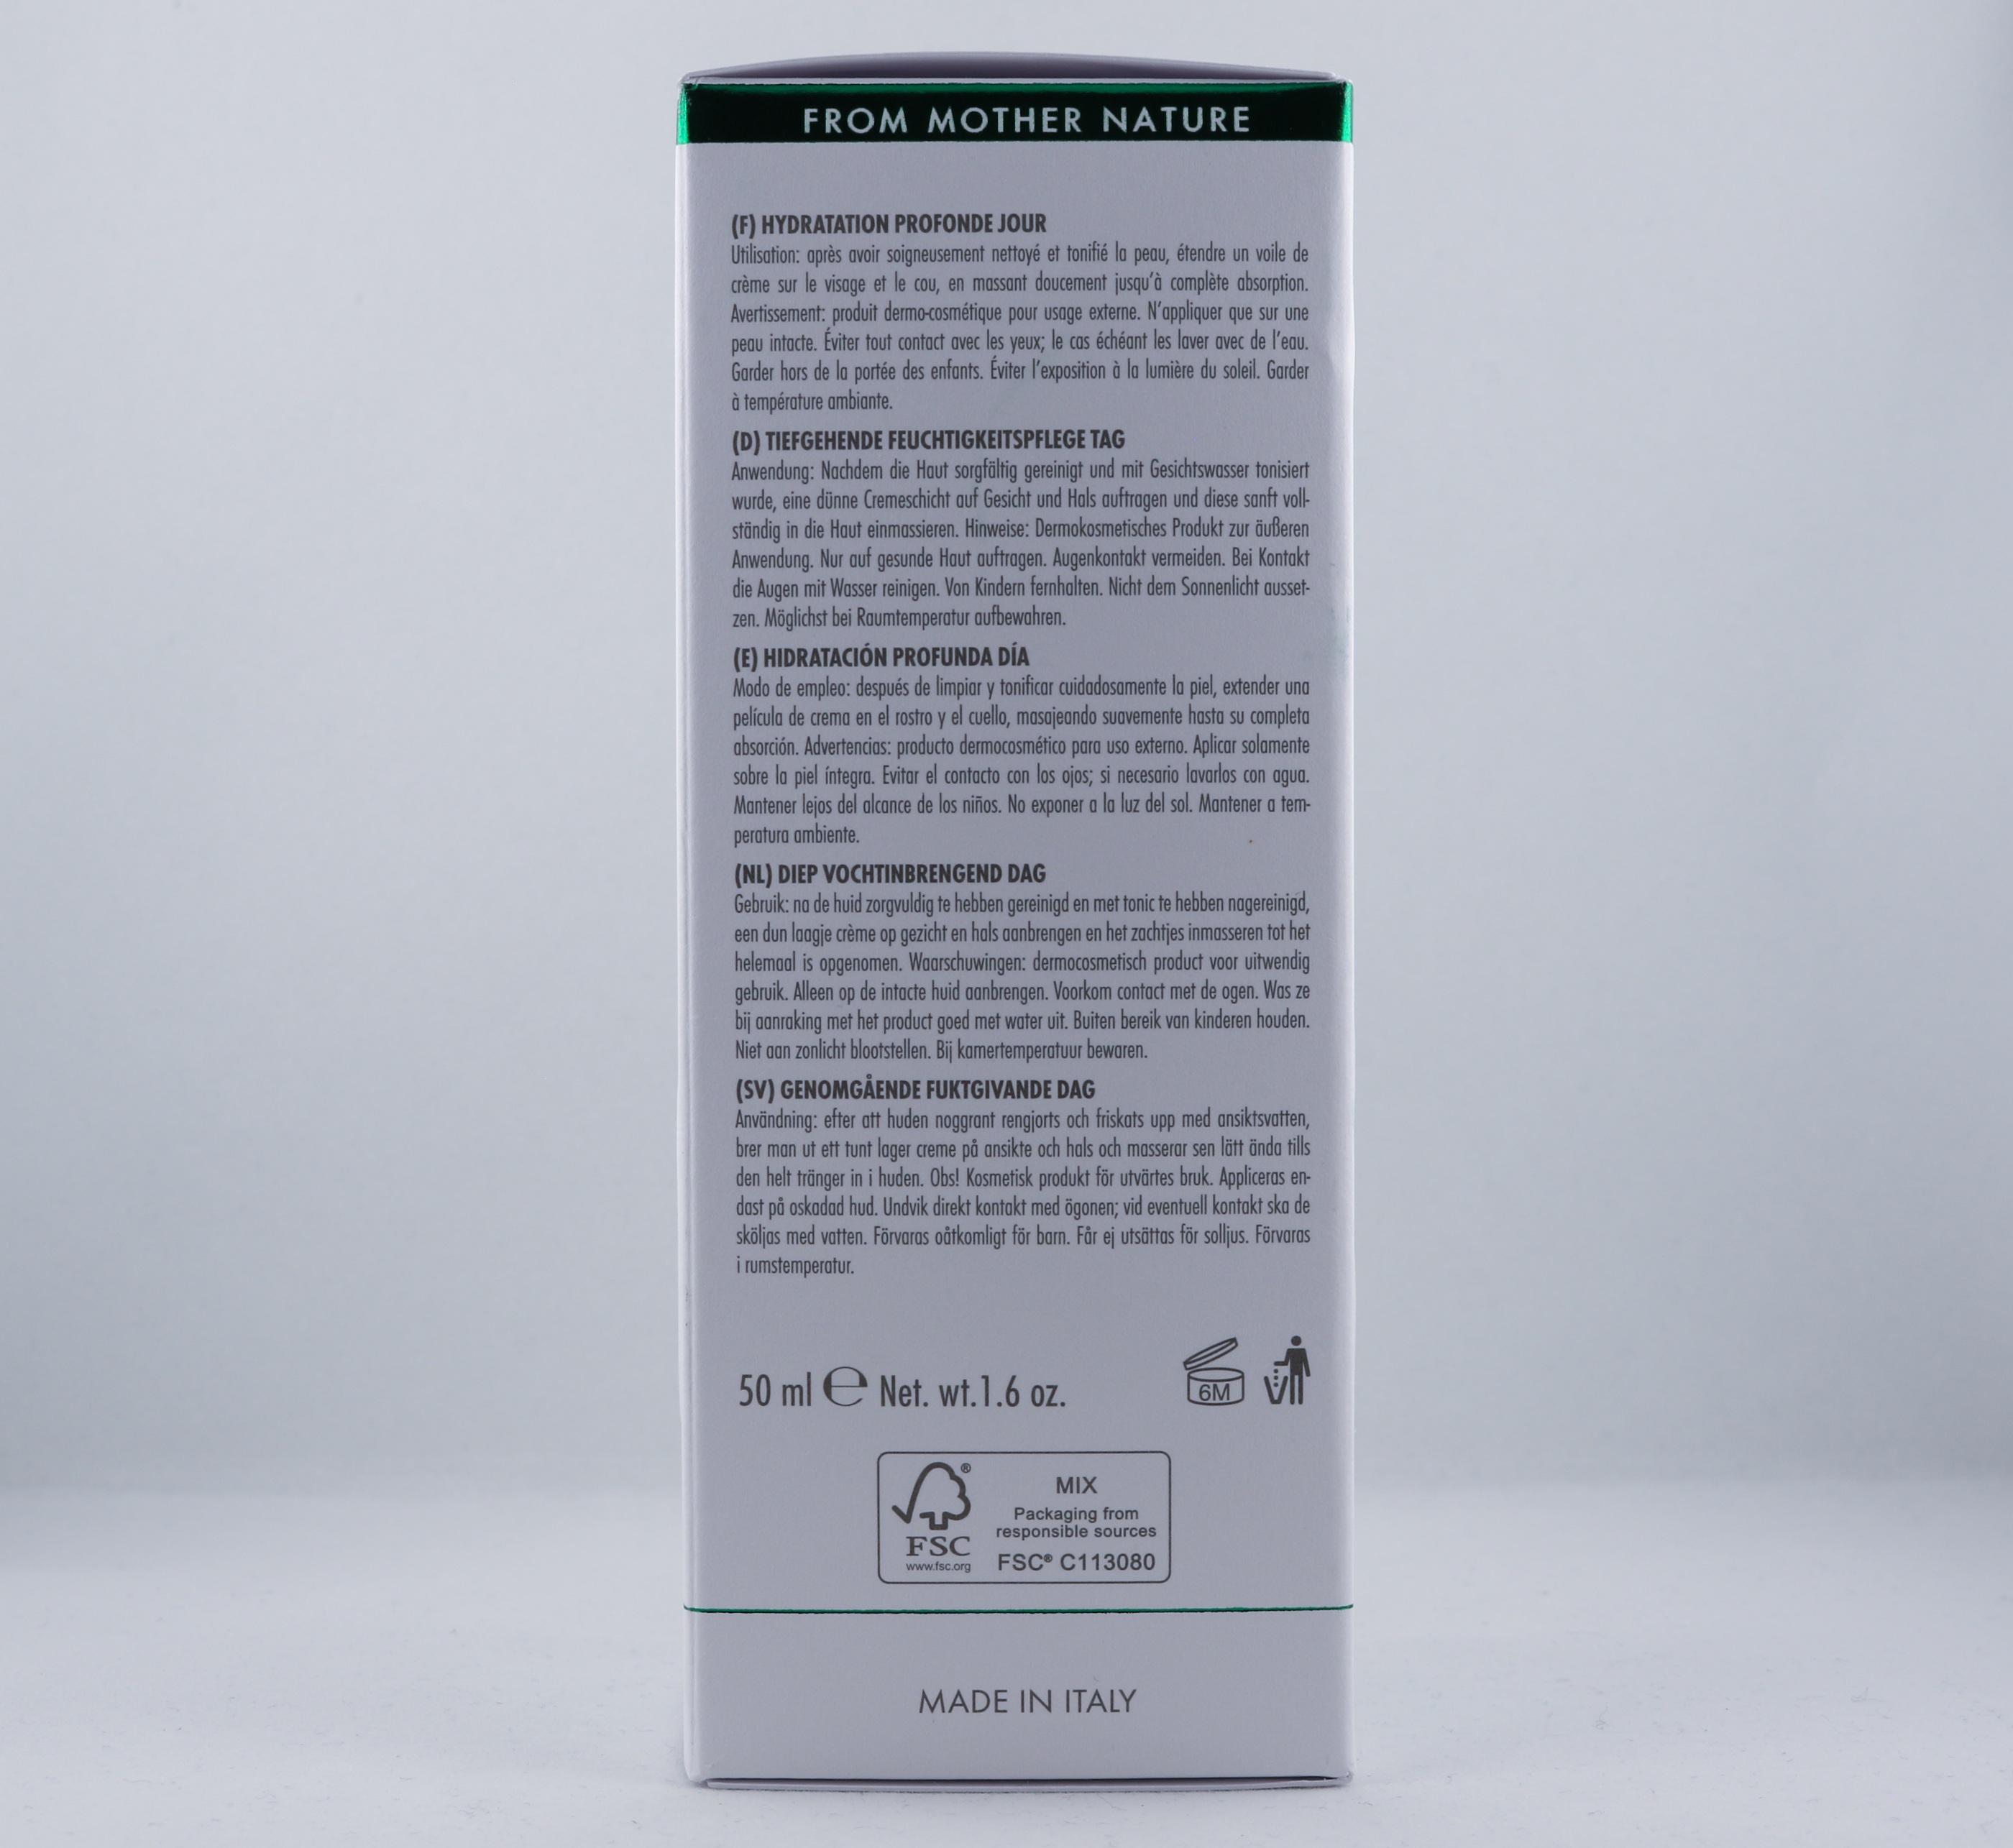 Vata Jasmine Cream hudvårdsprodukt hudvårdstyp alternativ hälsa wellness ayurveda hudvård